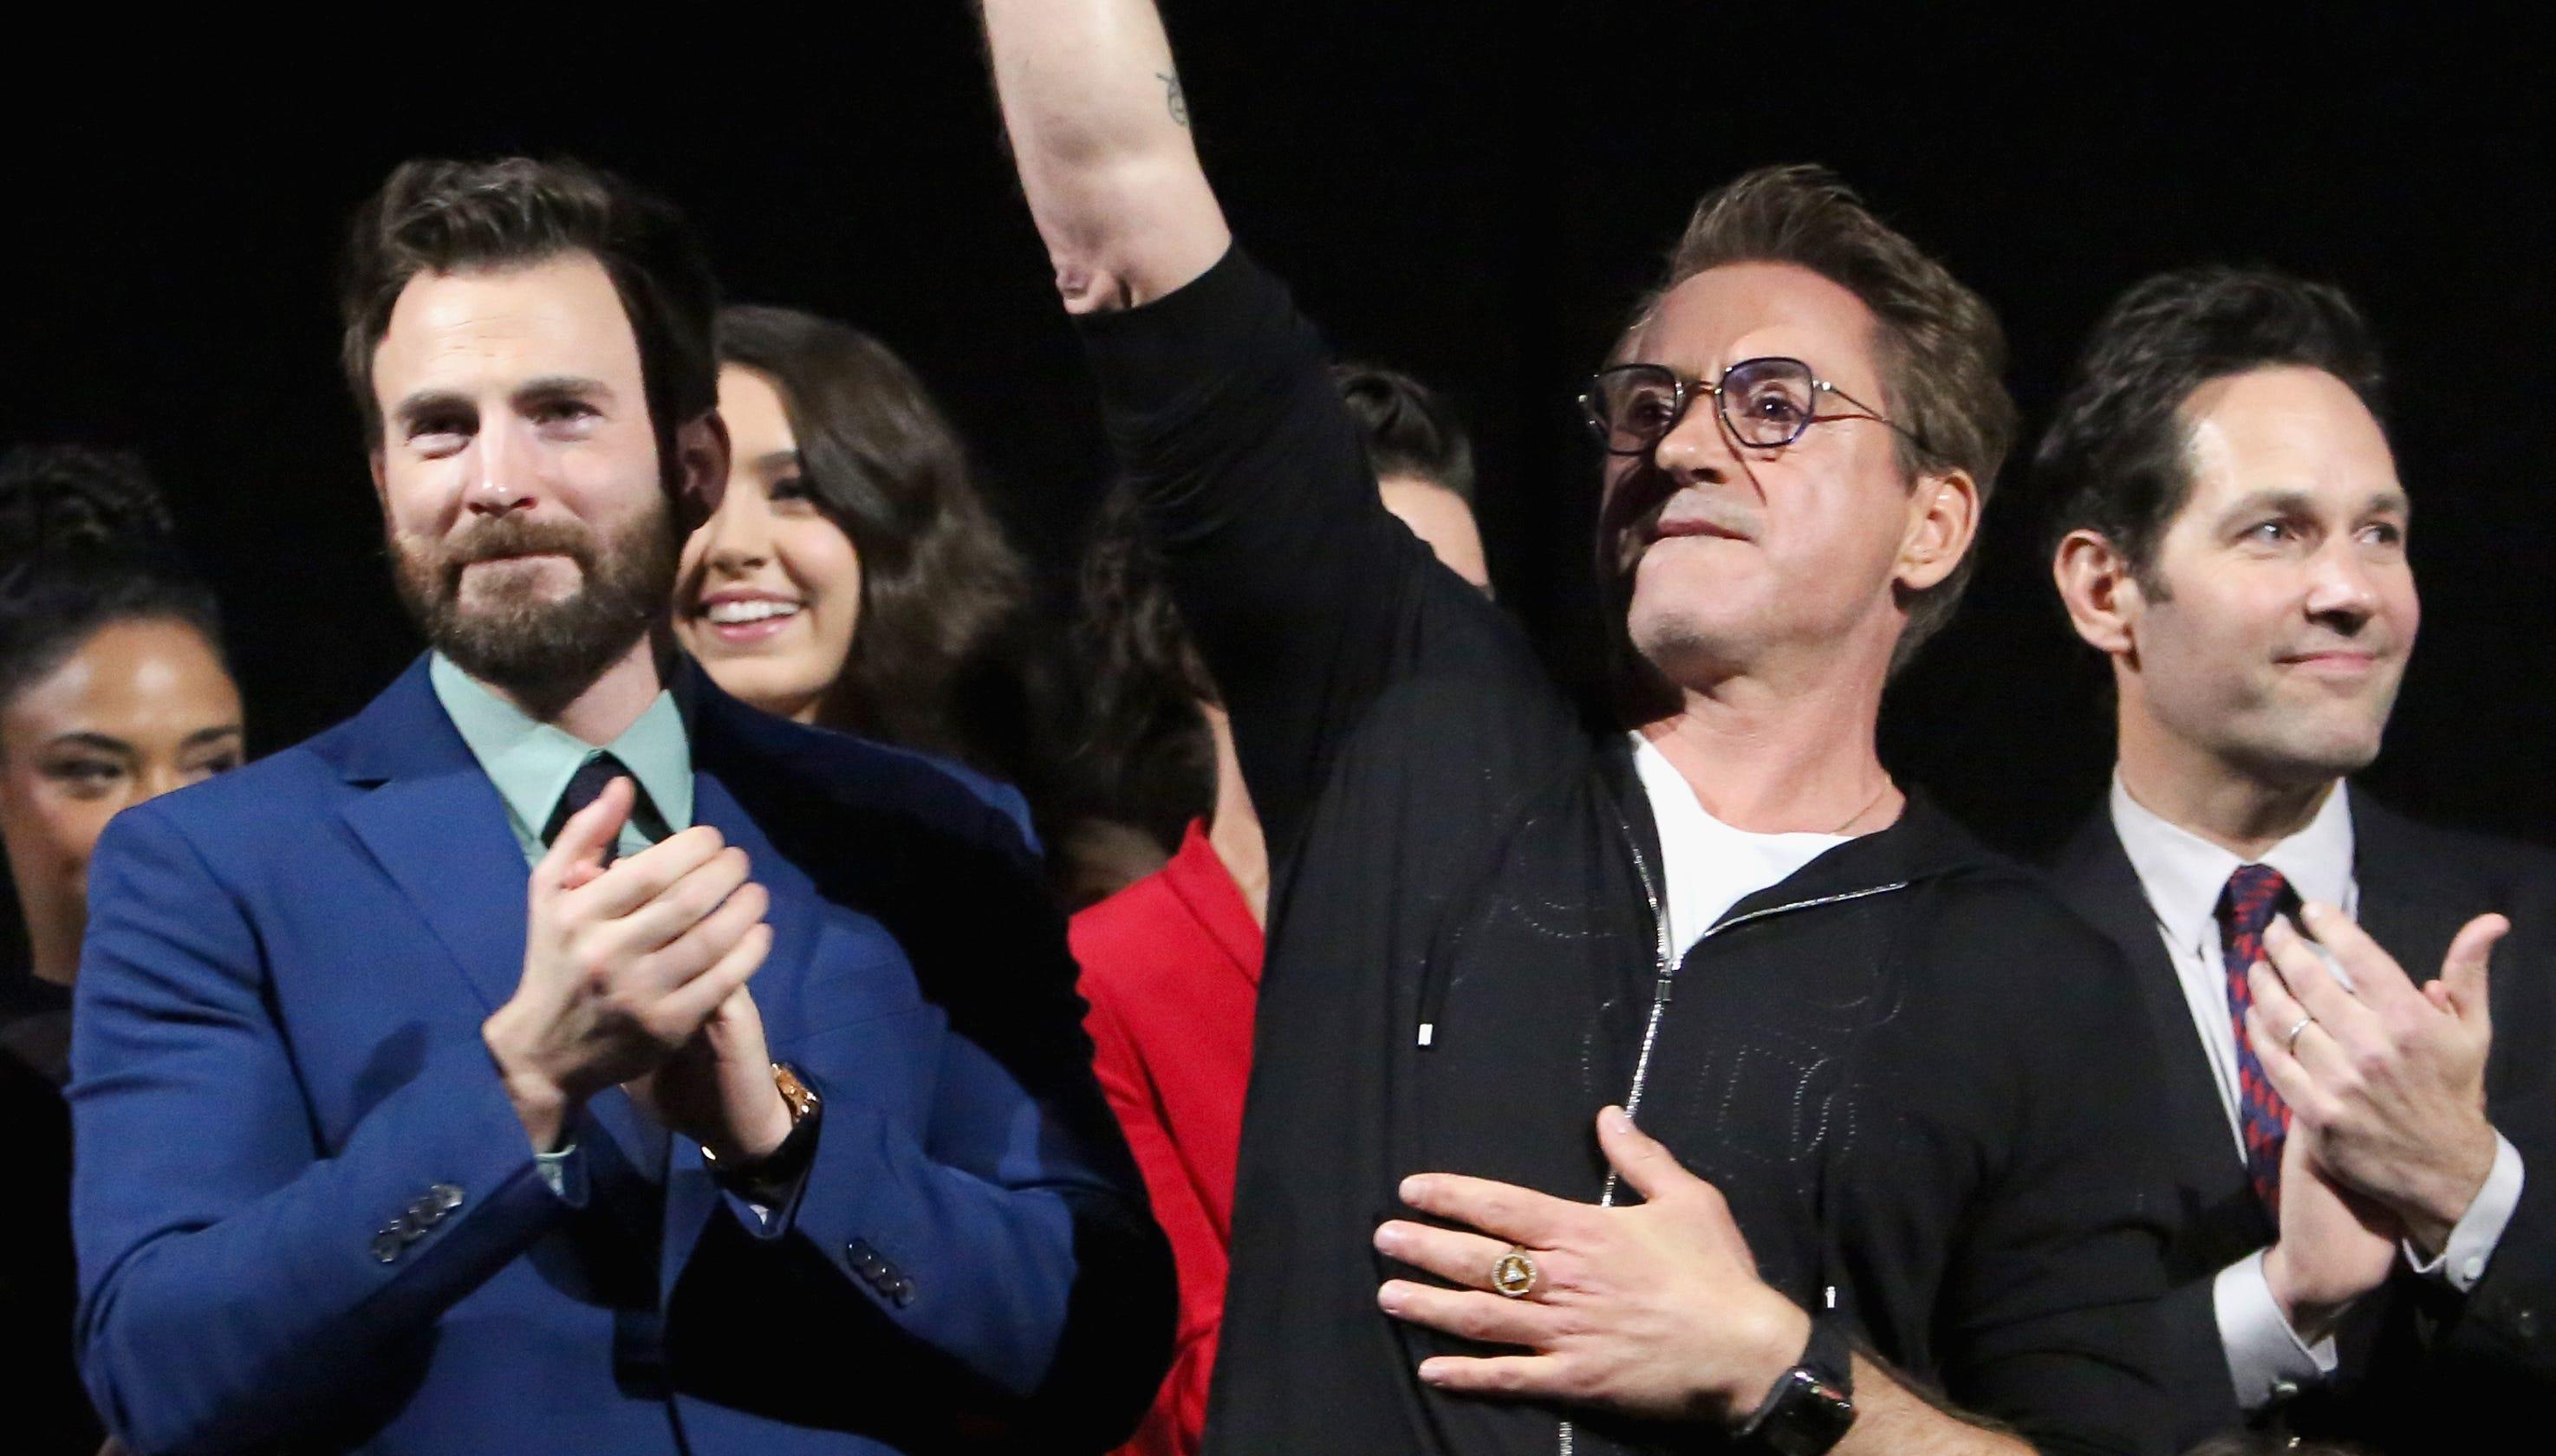 Avengers Endgame Chris Evans Robert Downey Jr Choke Up At Premiere